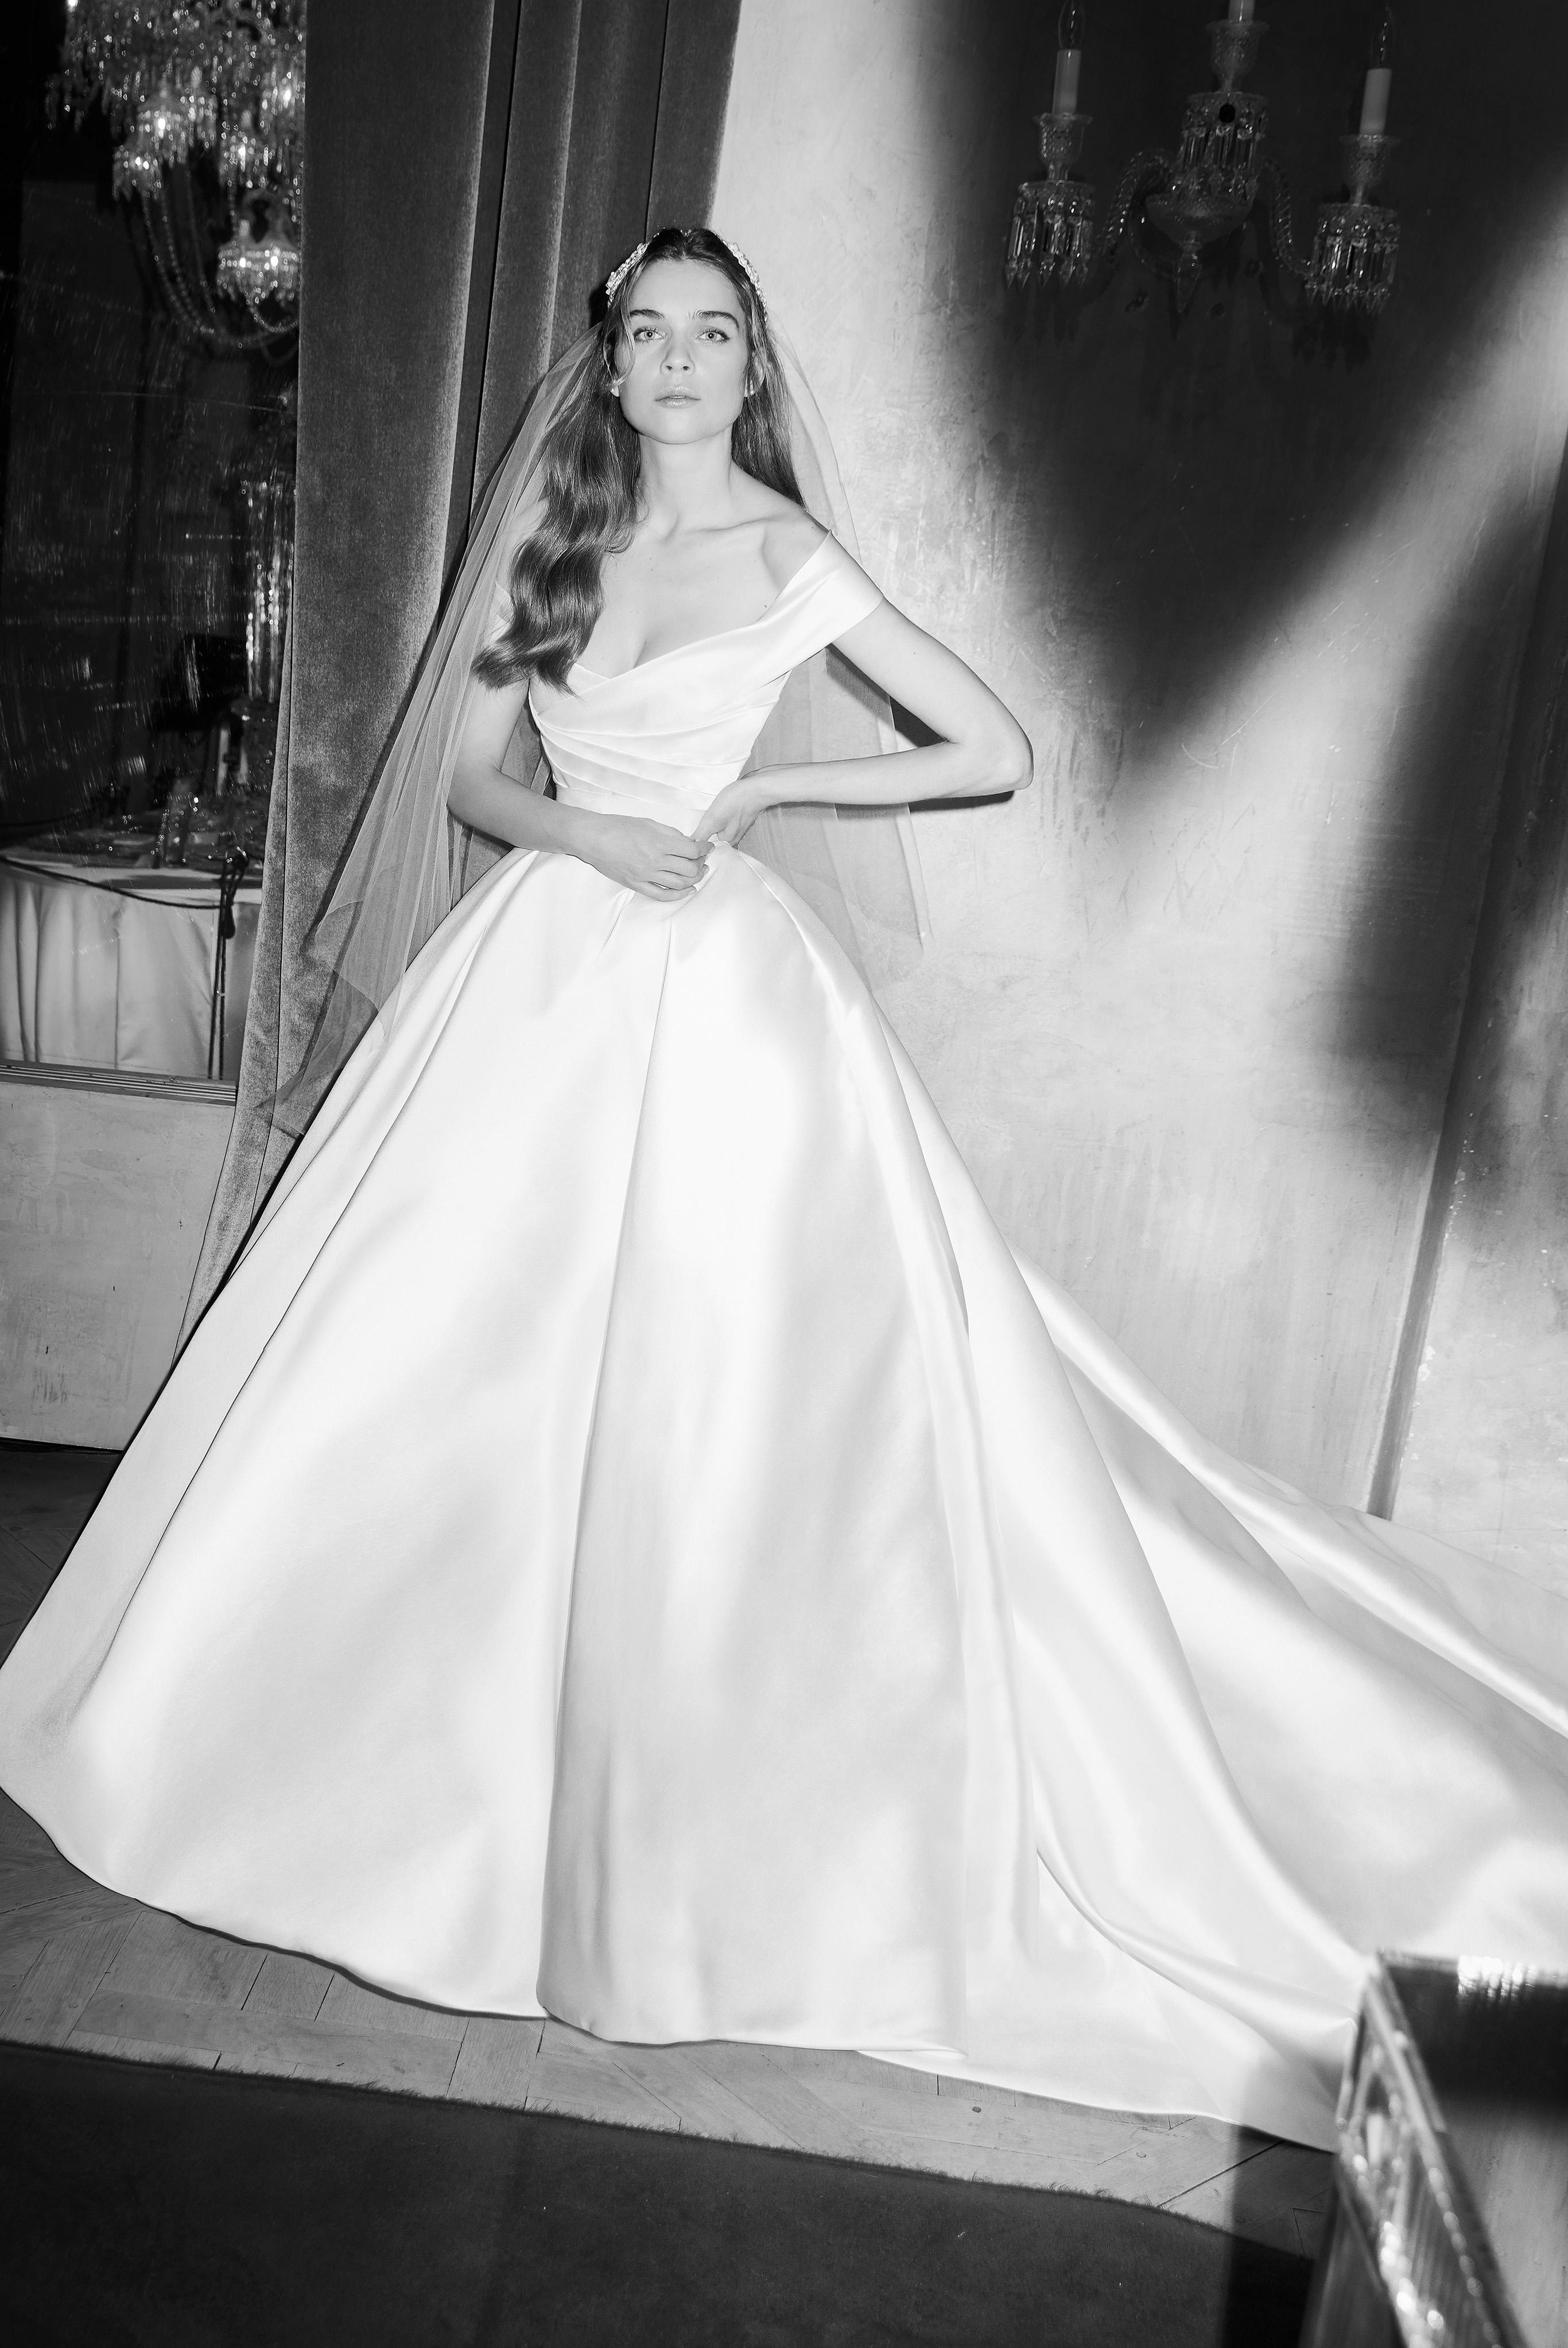 elie saab wedding dress spring 2019 off the shoulder satin ballgown